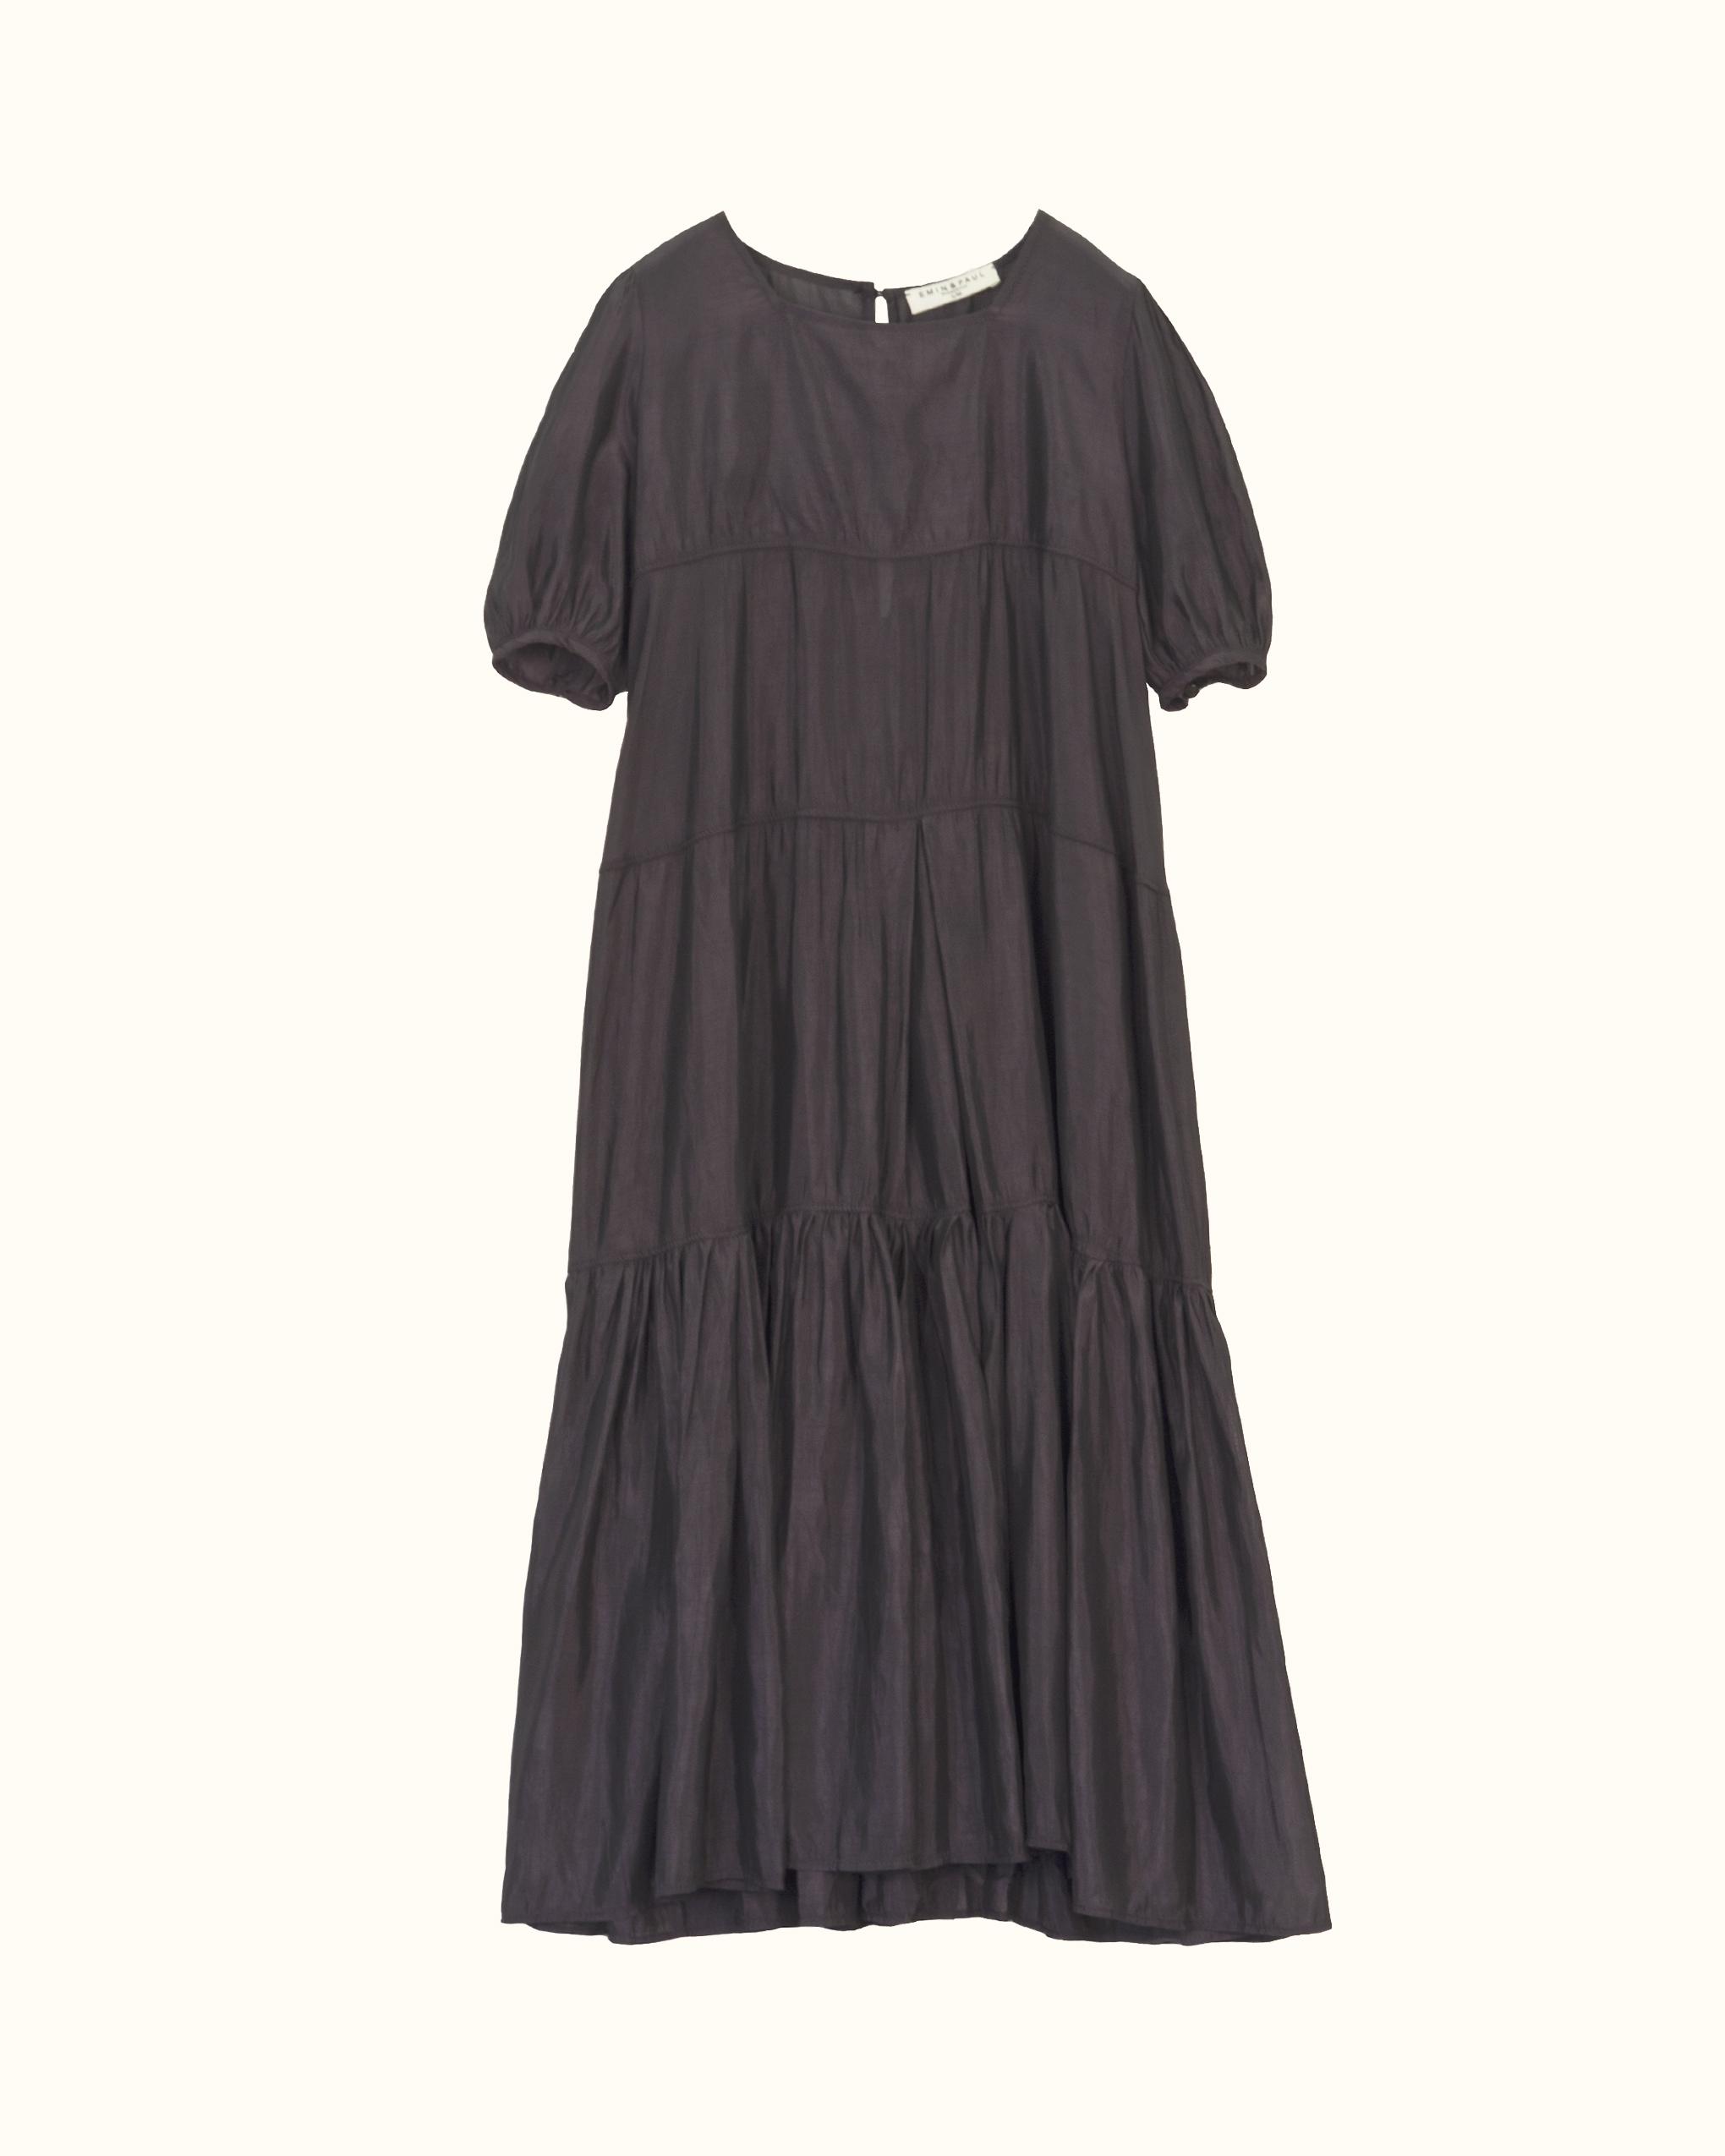 A black tiered smock dress.